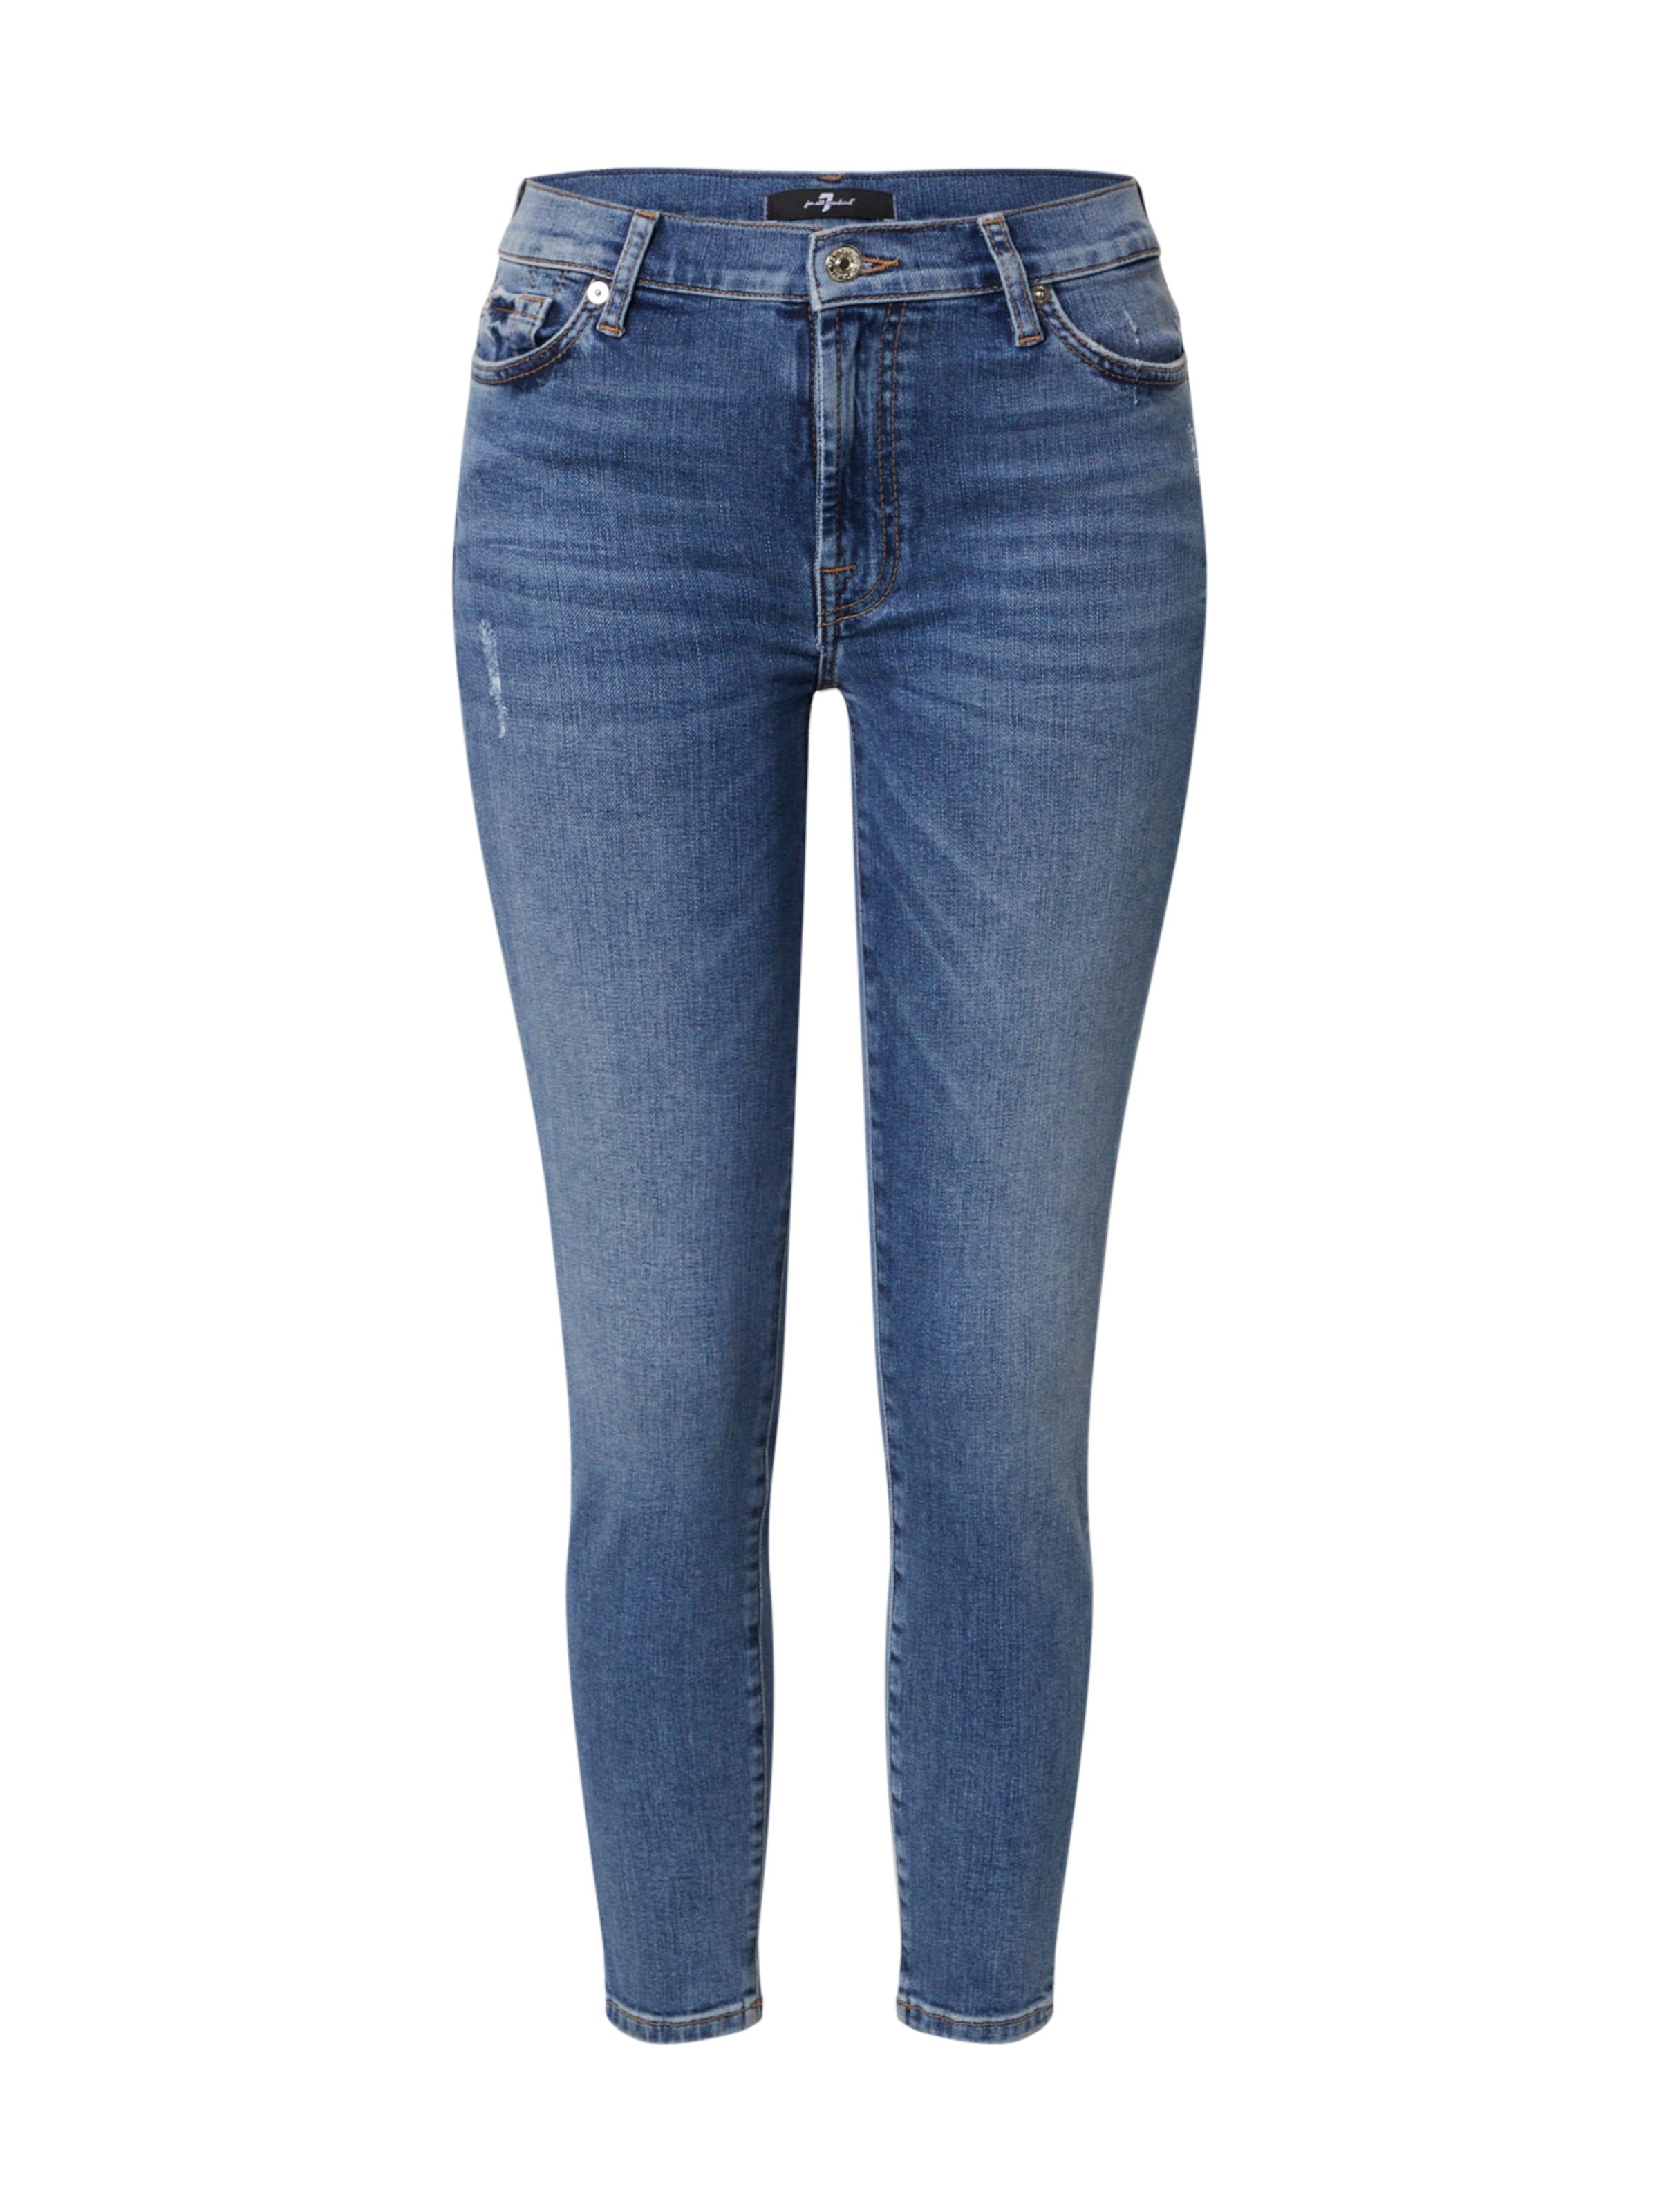 7 for all mankind Jeans i blå denim